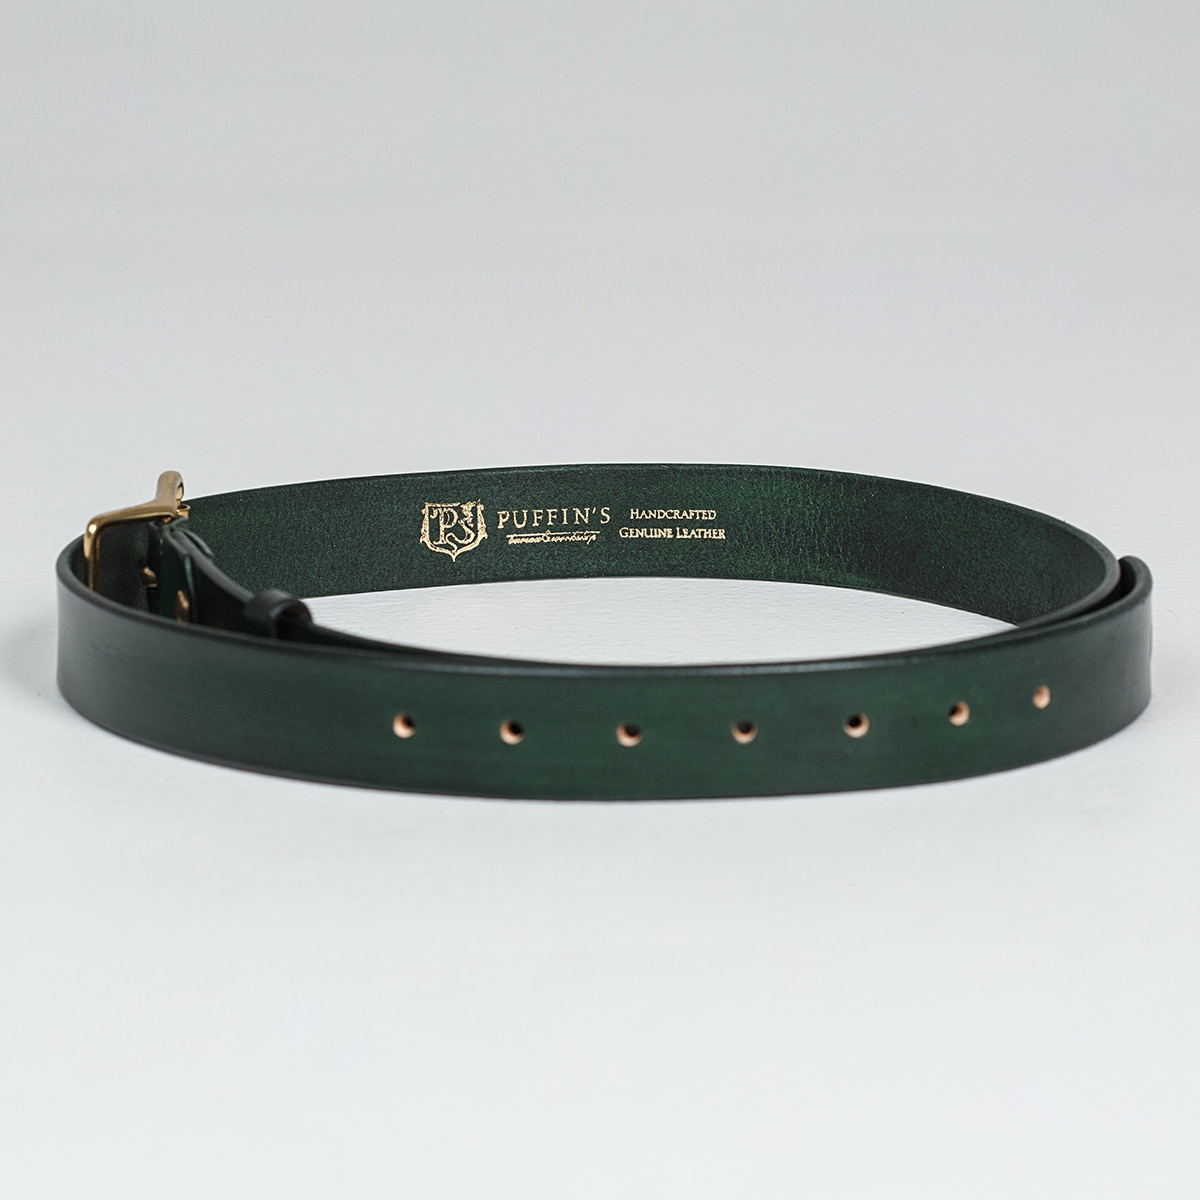 Exquisite belt with roller brass buckle 30mm grassy green